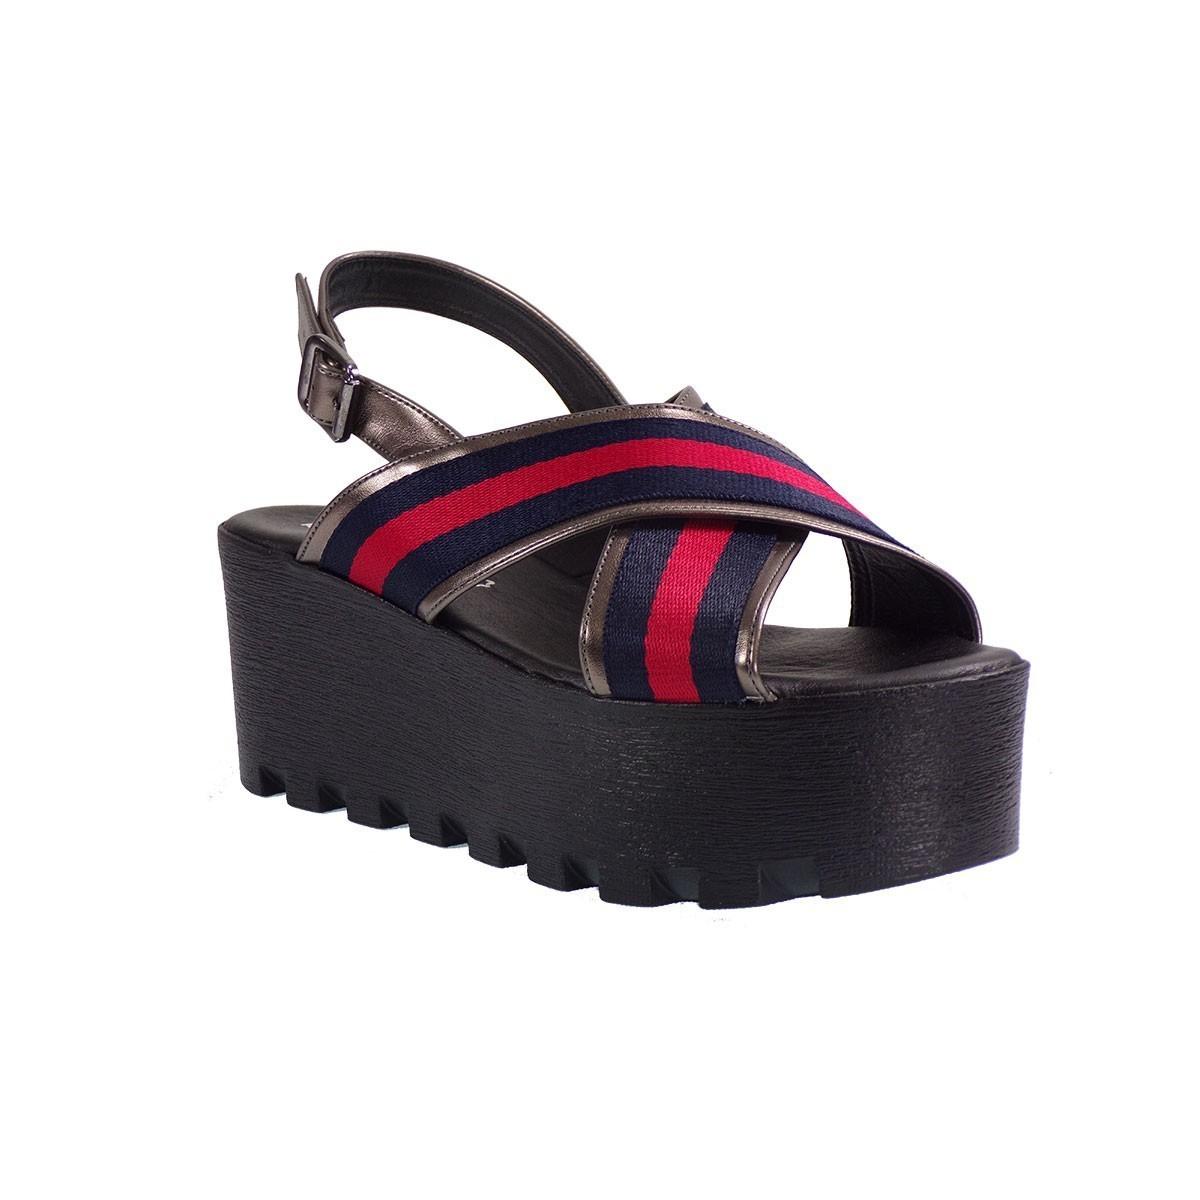 Katia Shoes Γυναικείες Πλατφόρμες Πέδιλα 135/2080 Ατσαλί-Μπλέ